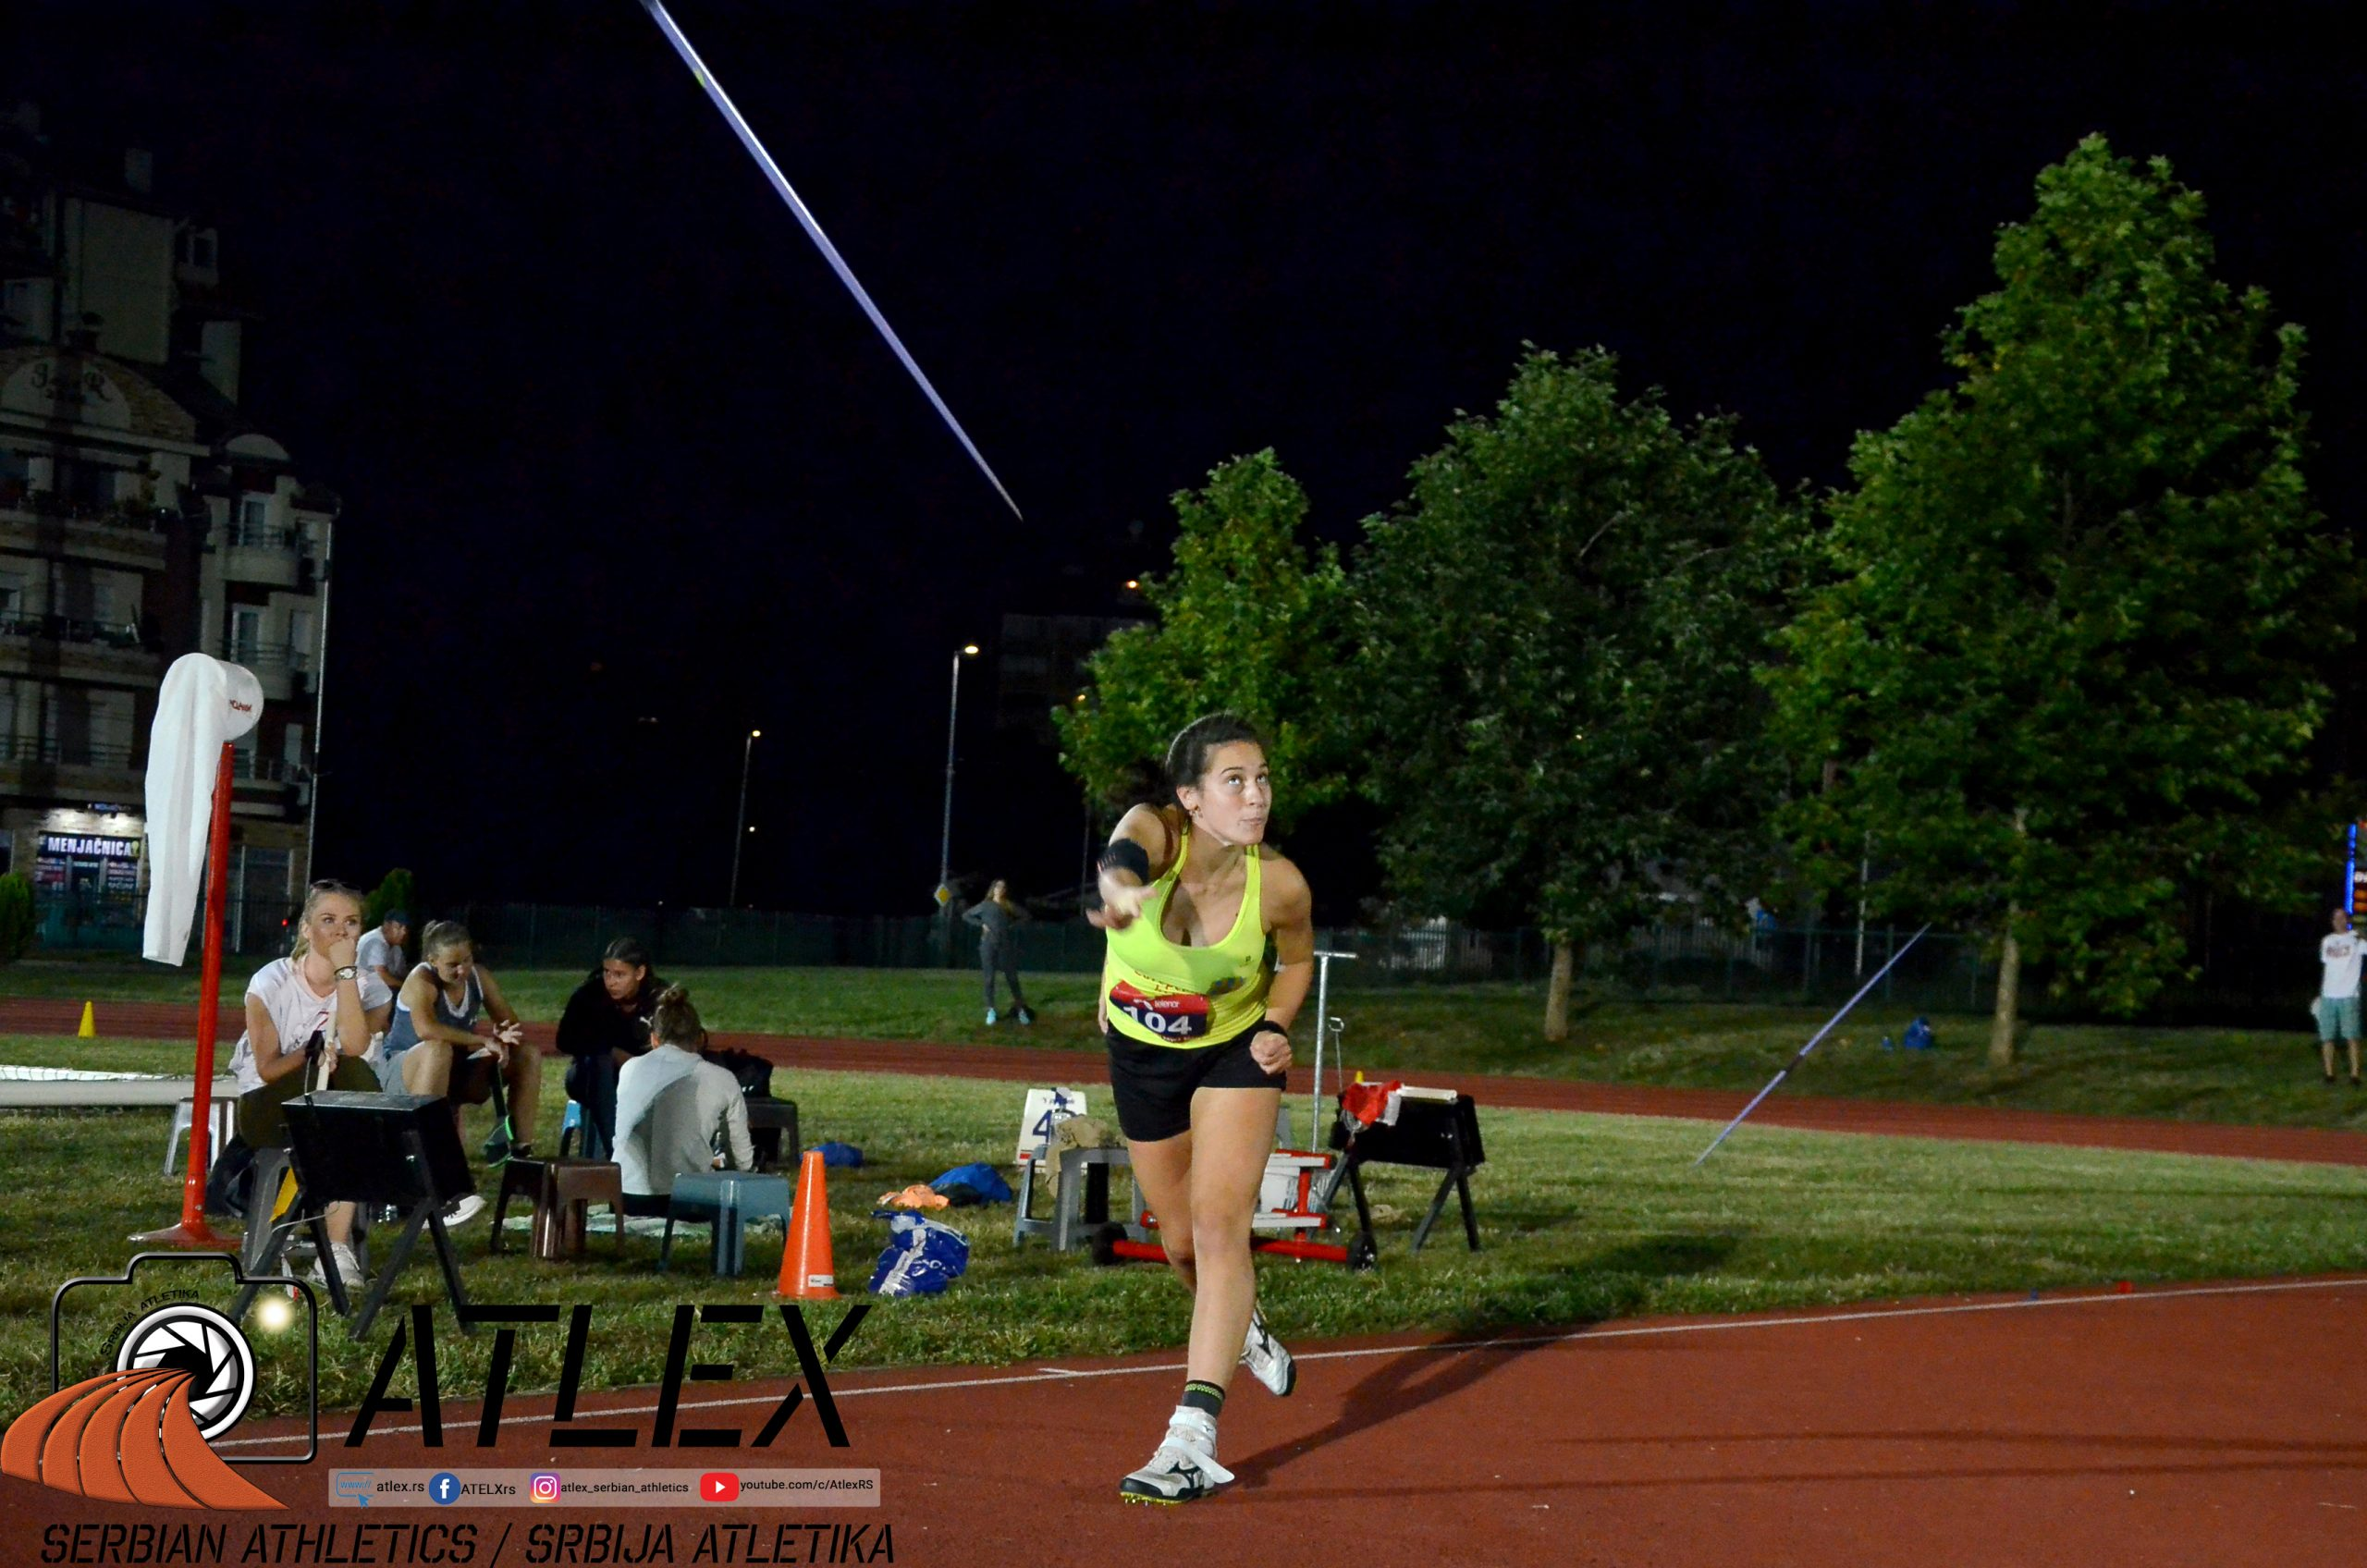 Adriana Vilagoš, juniorsko prvenstvo Srbije 2020, bacanje koplja